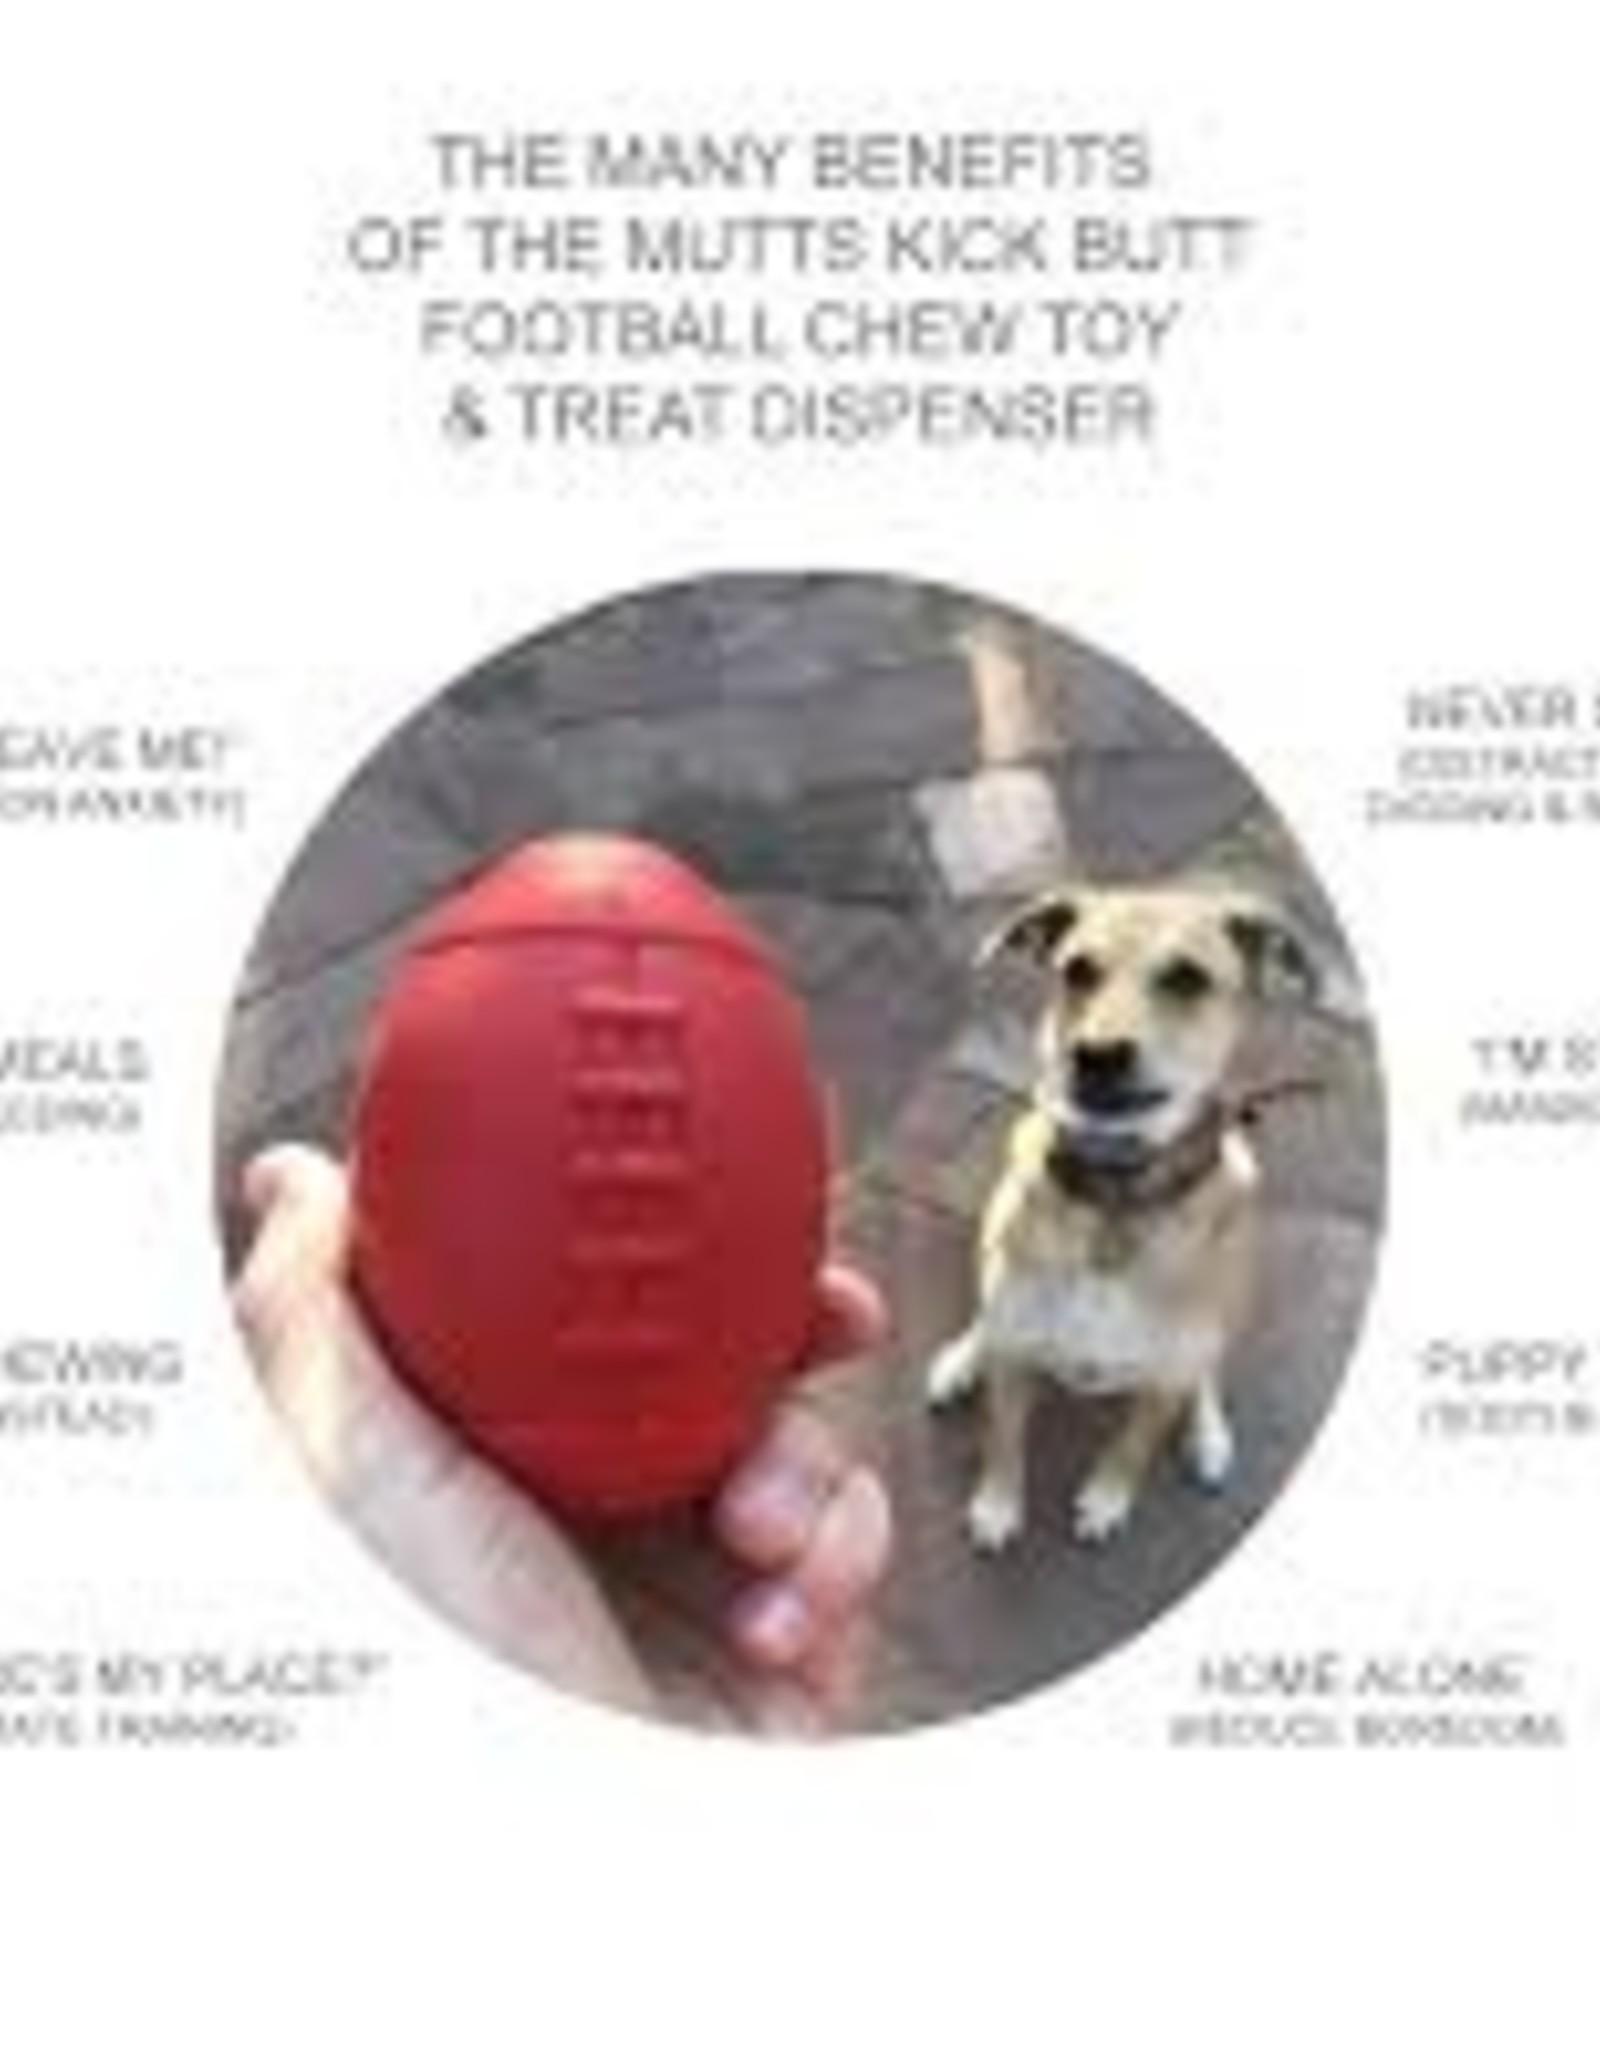 Mutts Kick Butts MKB Dog Chew Toy Football & Treat Dispenser Lrg